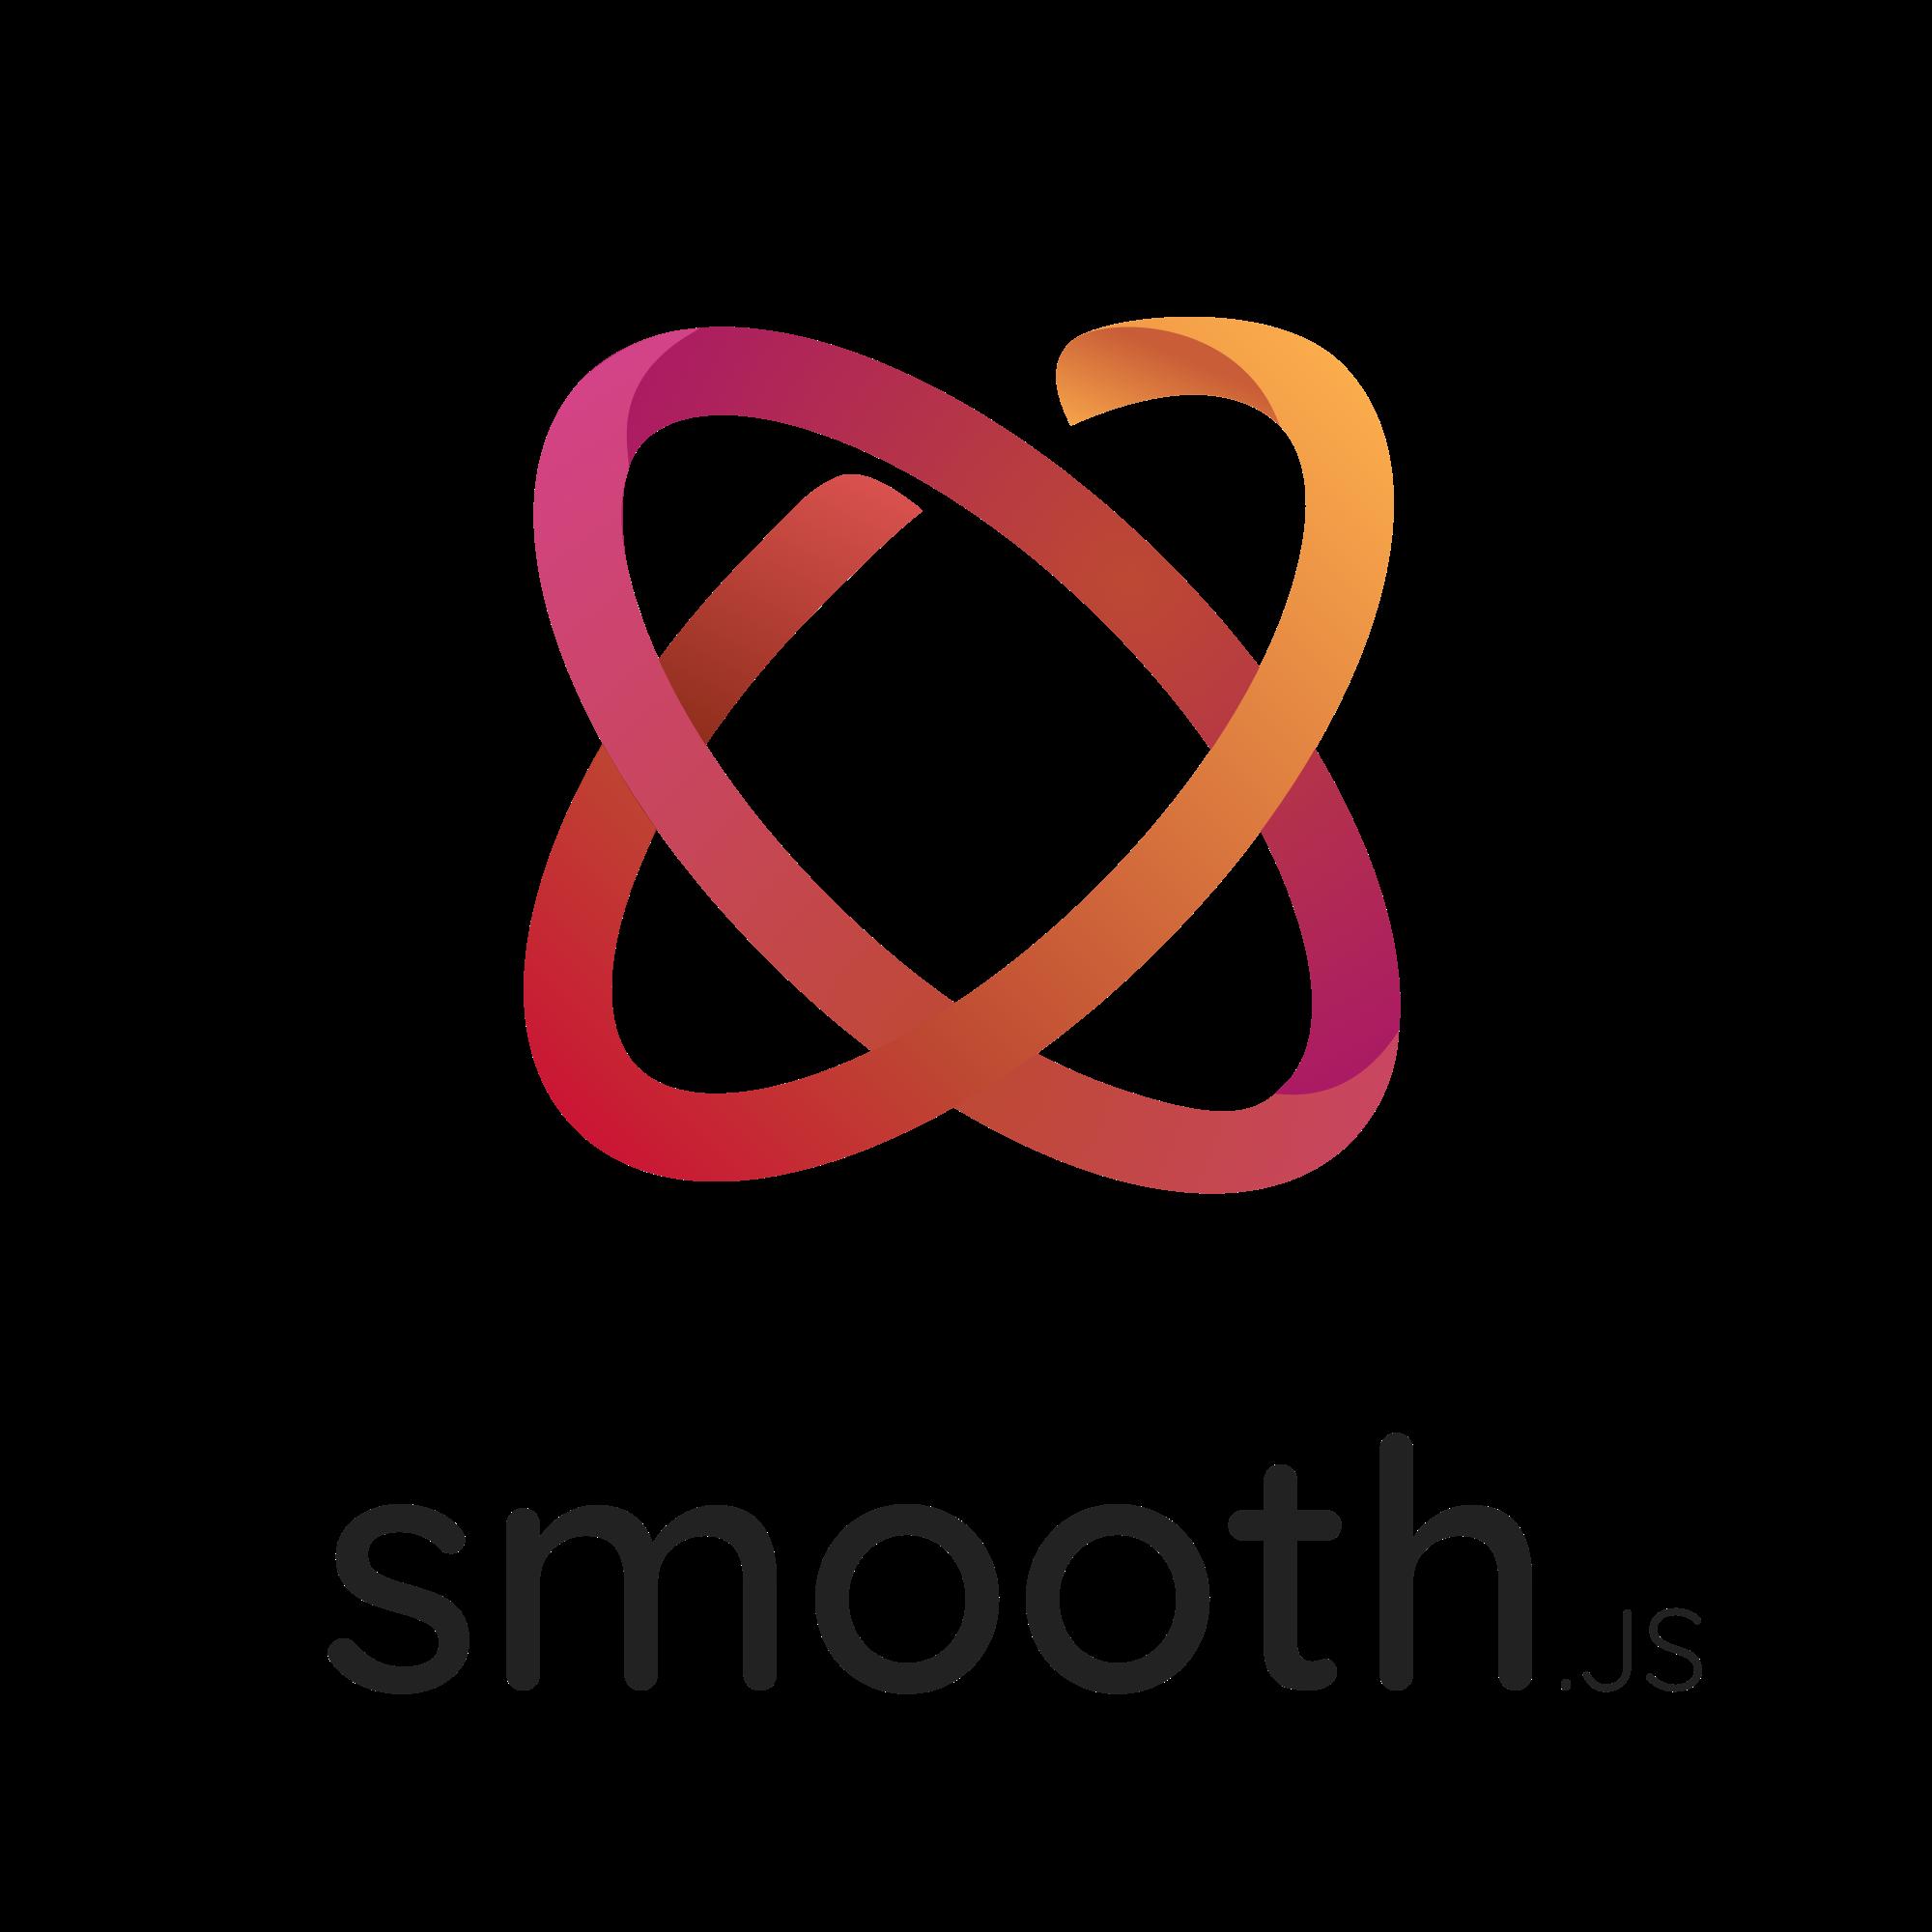 Smooth.js